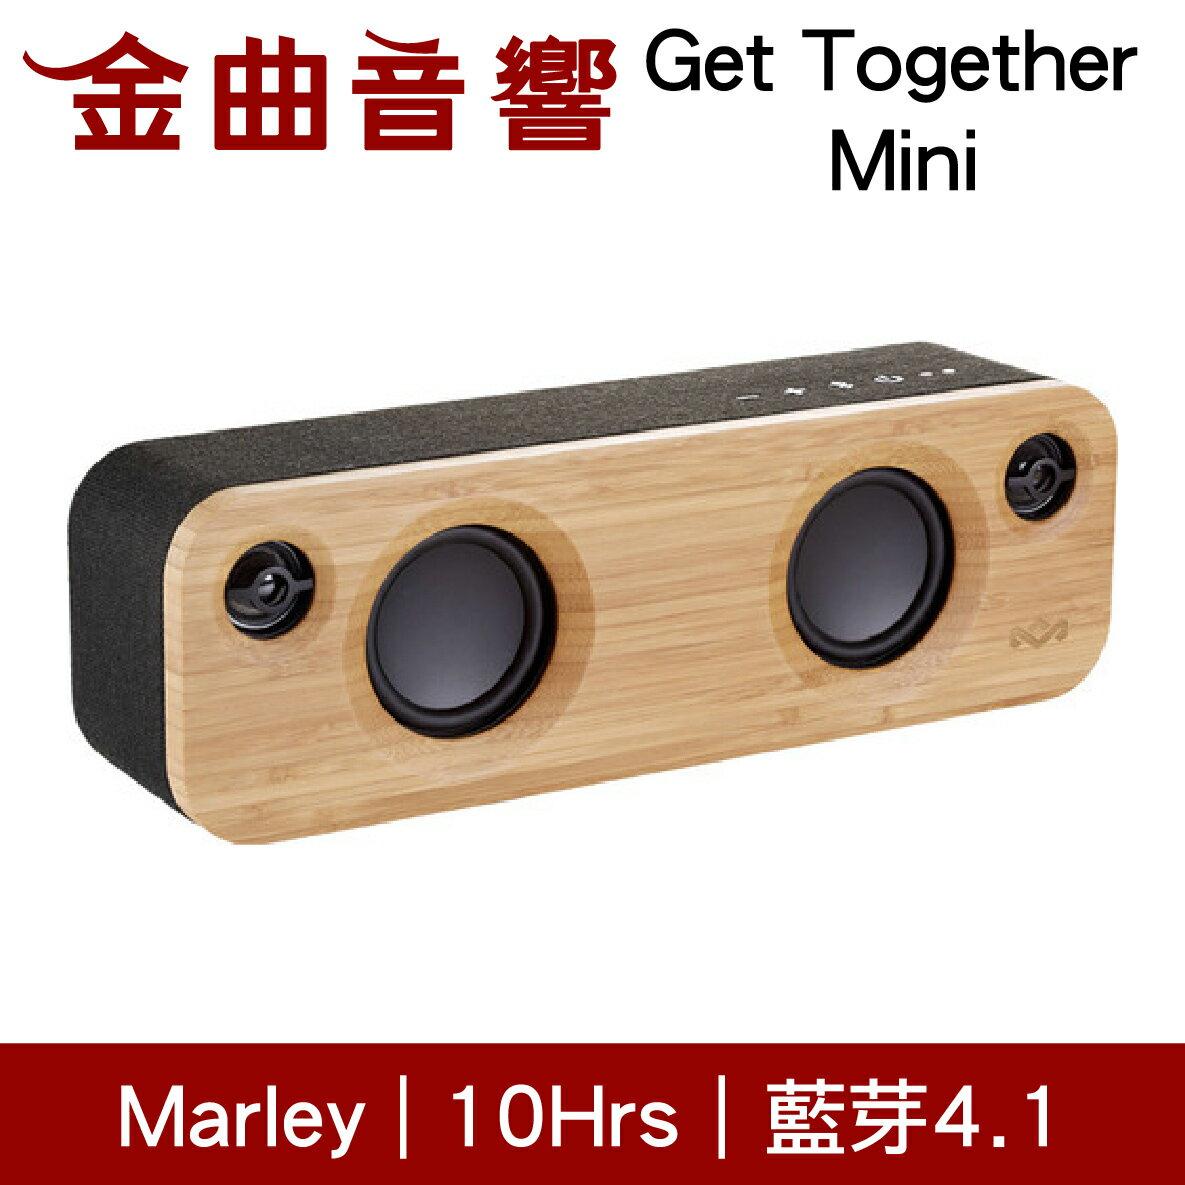 Marley Get Together Mini 黑色 藍牙喇叭 經典木質喇叭 高清完美音質 | 金曲音響